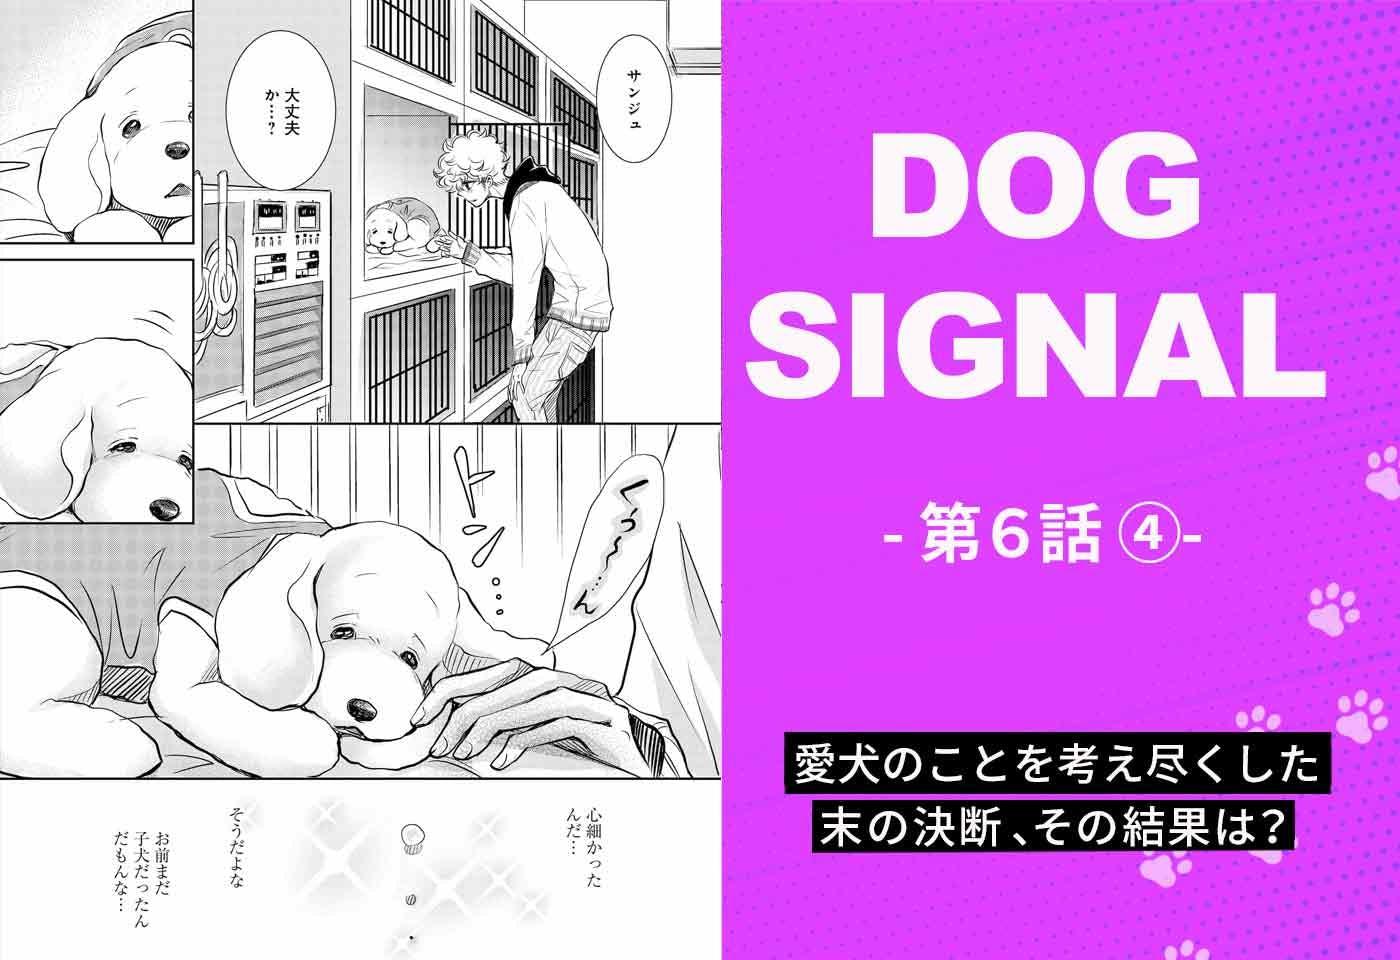 『DOG SIGNAL』6話目 4/4